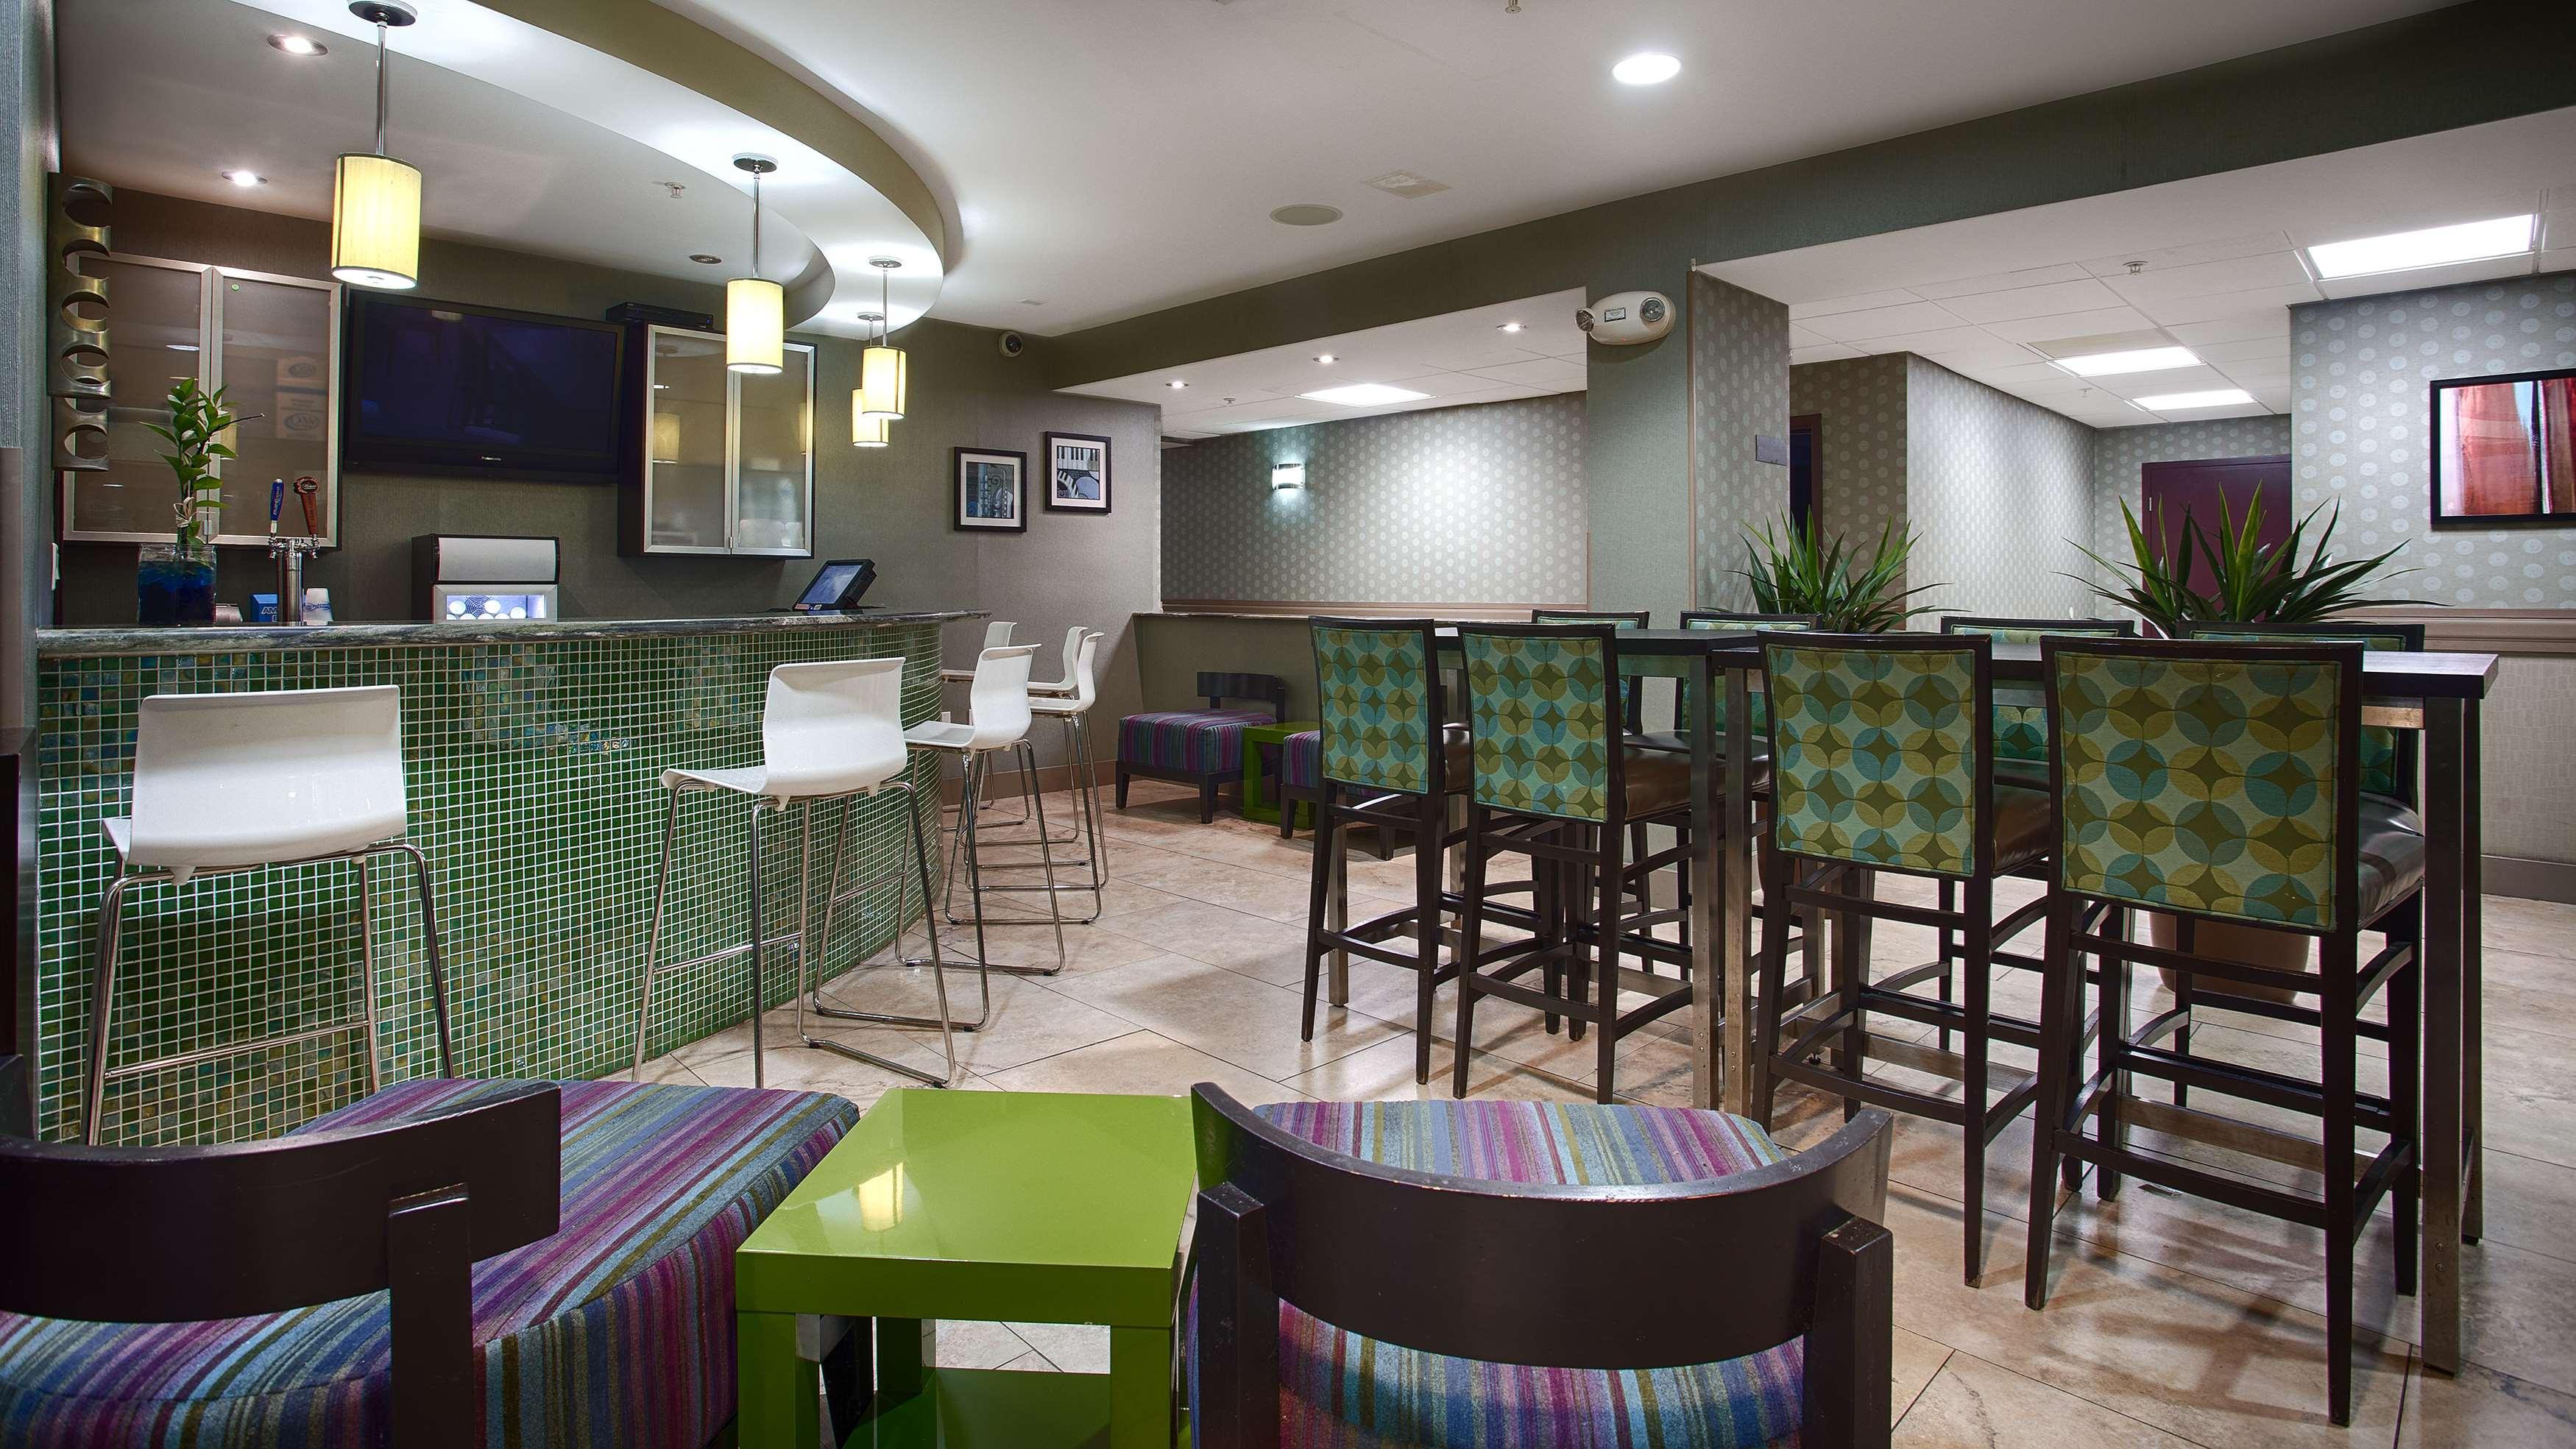 Best Western Plus Fort Lauderdale Airport South Inn & Suites image 7